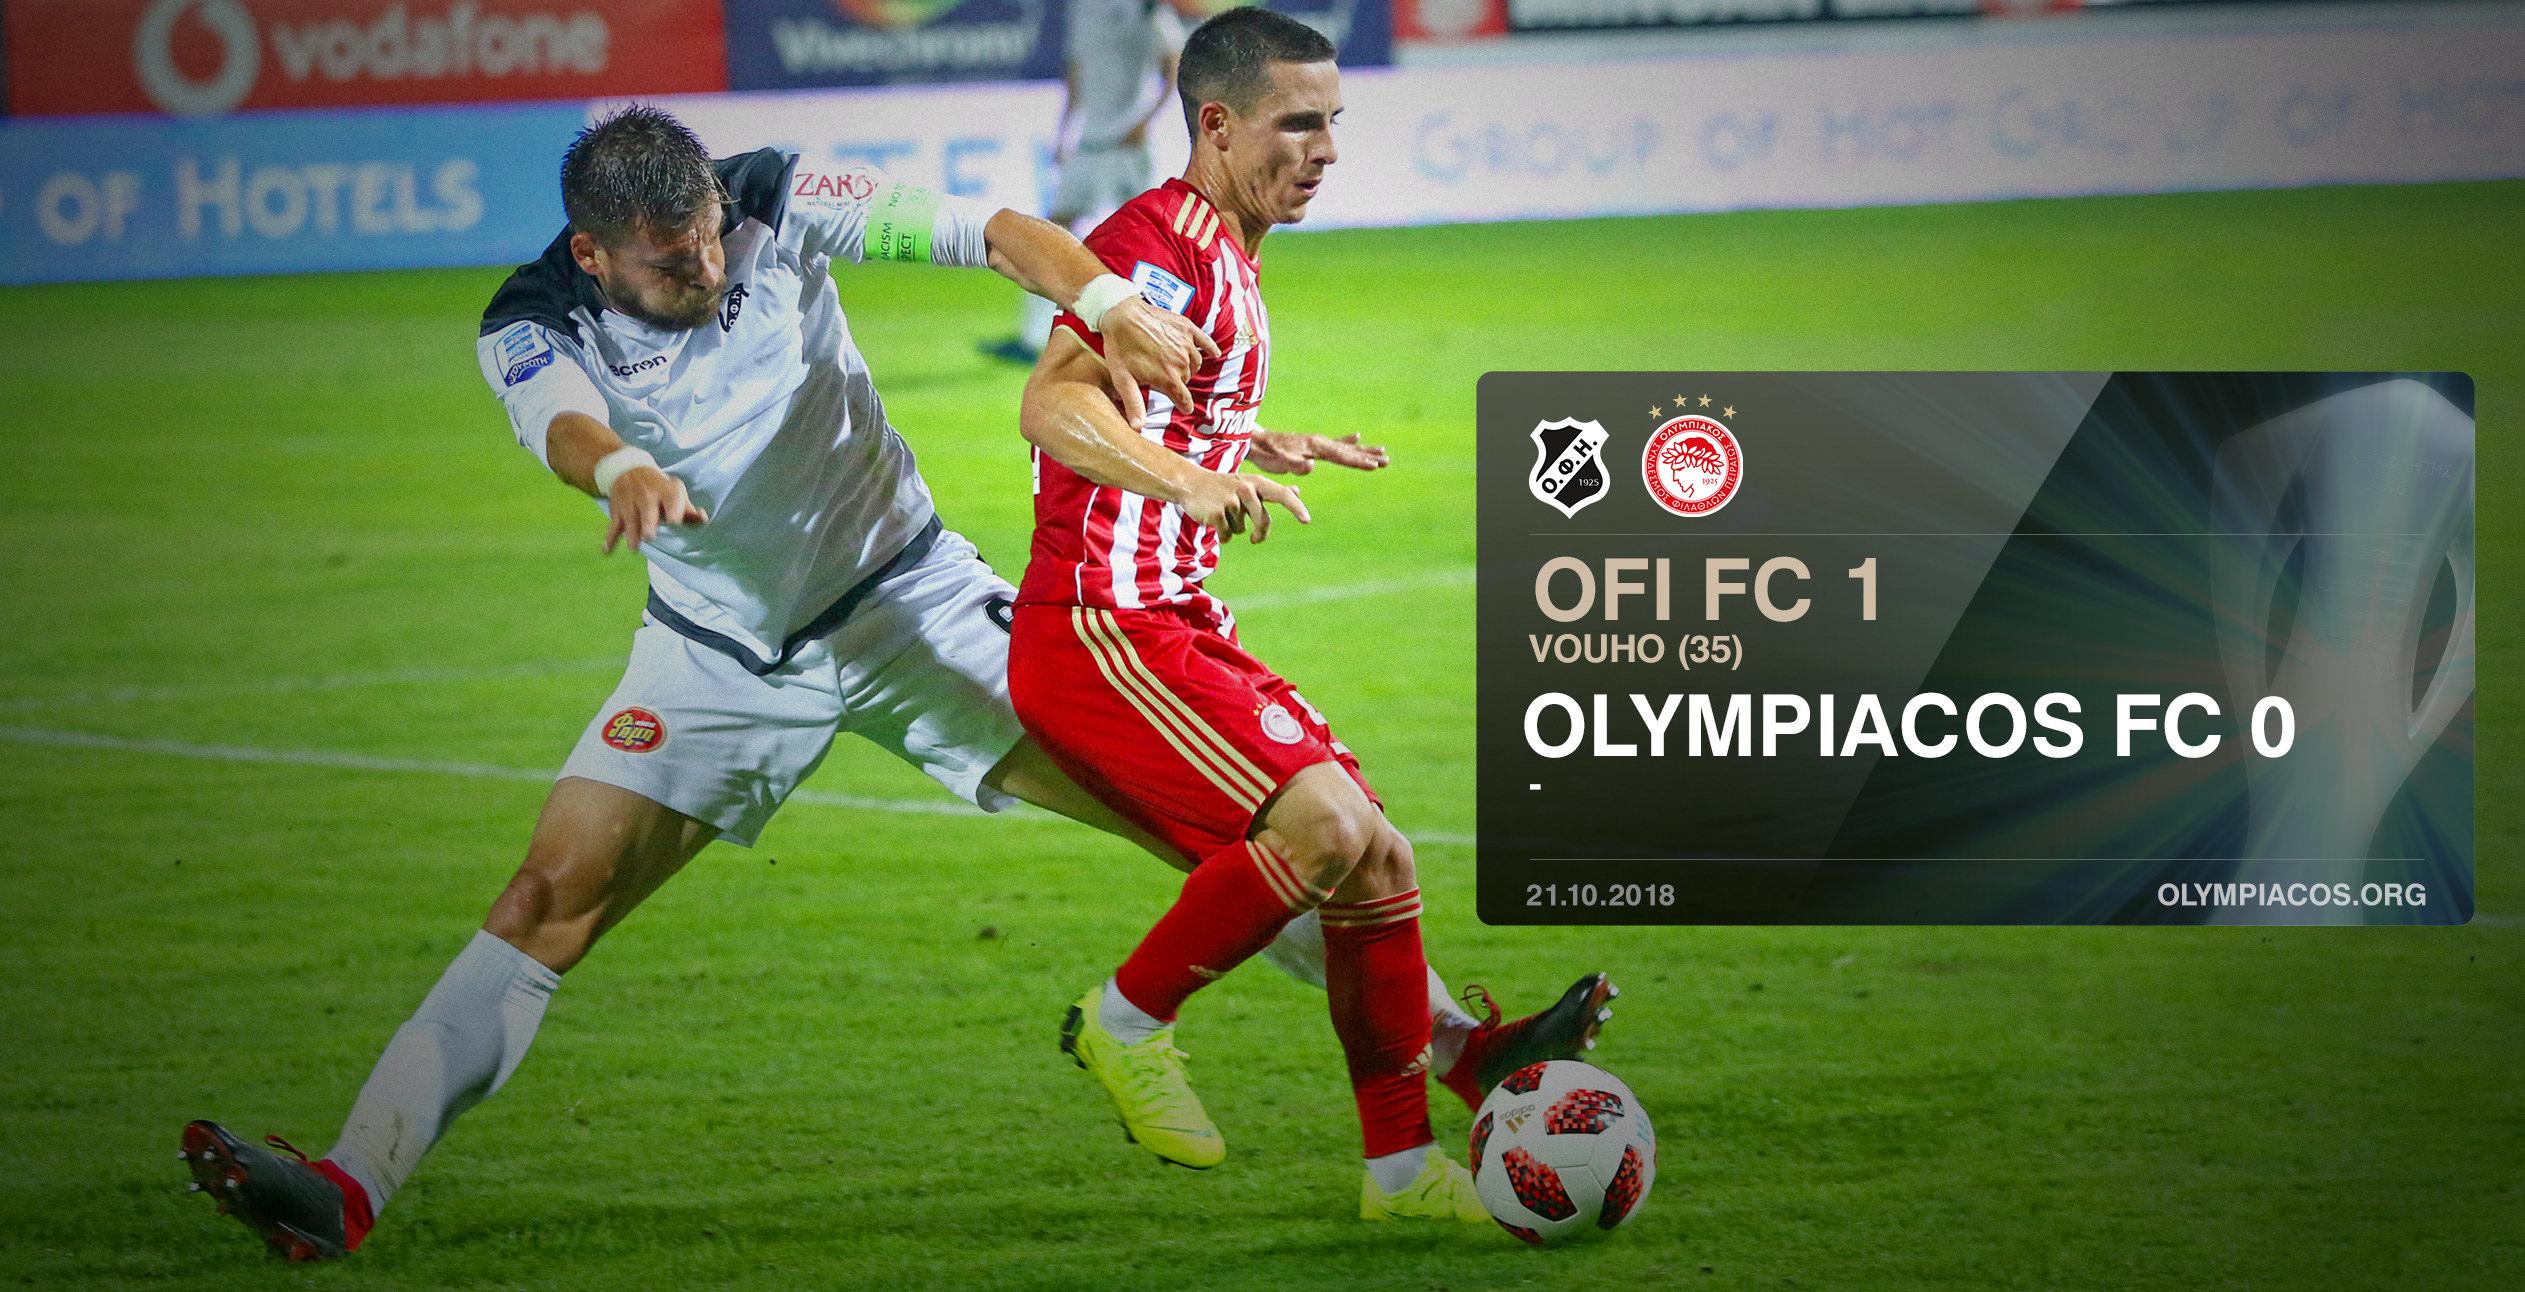 OFI – Olympiacos 1-0